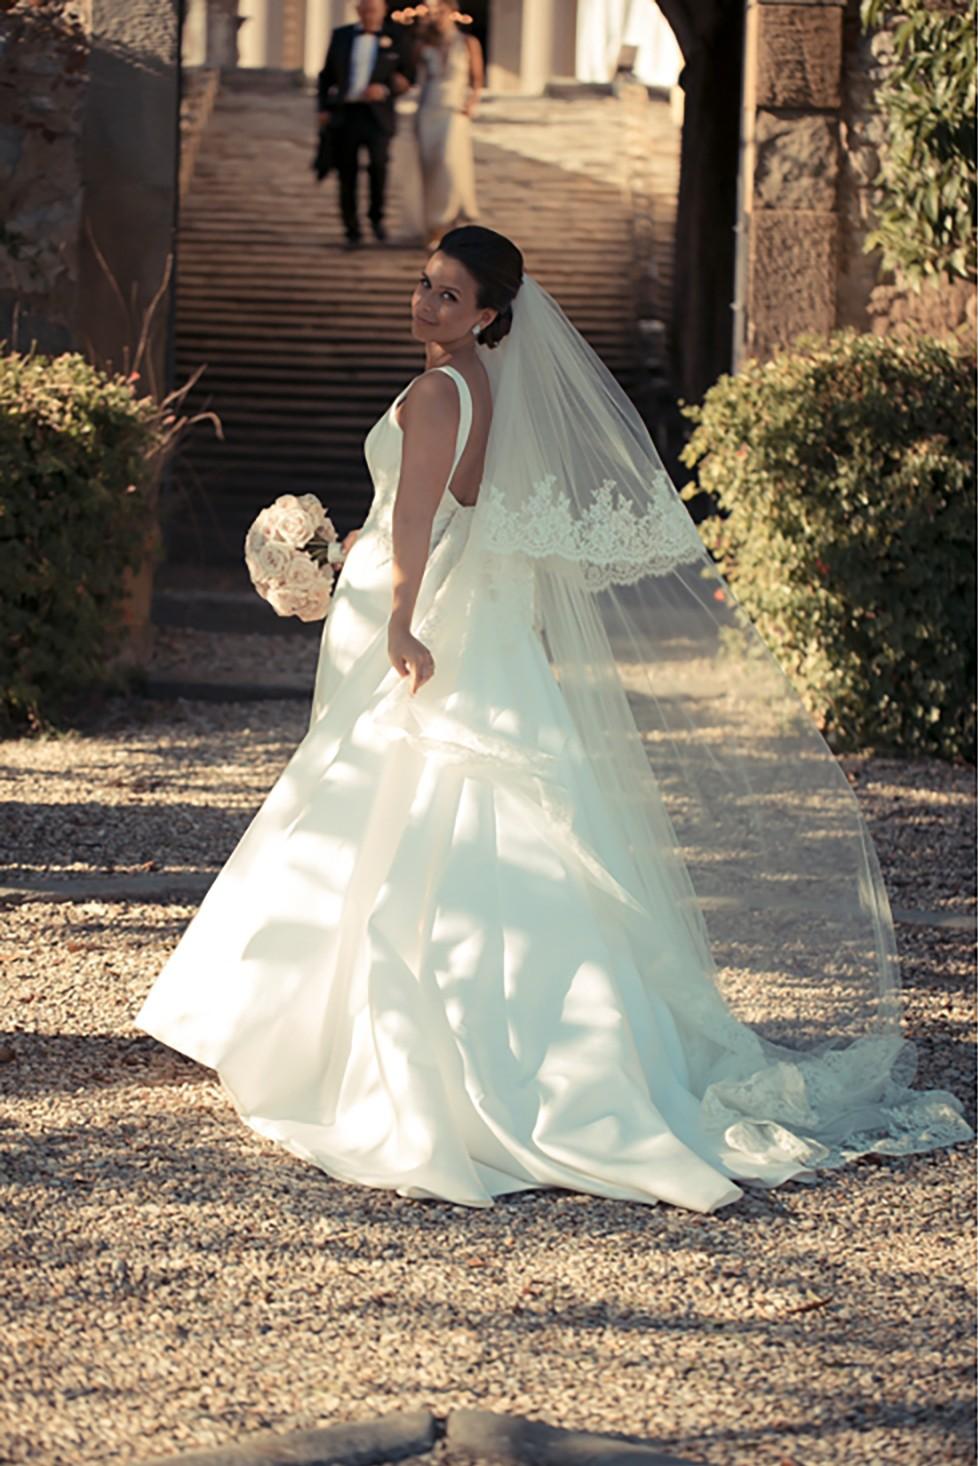 Jewish-wedding-Florence_0390-1-e1455036693550